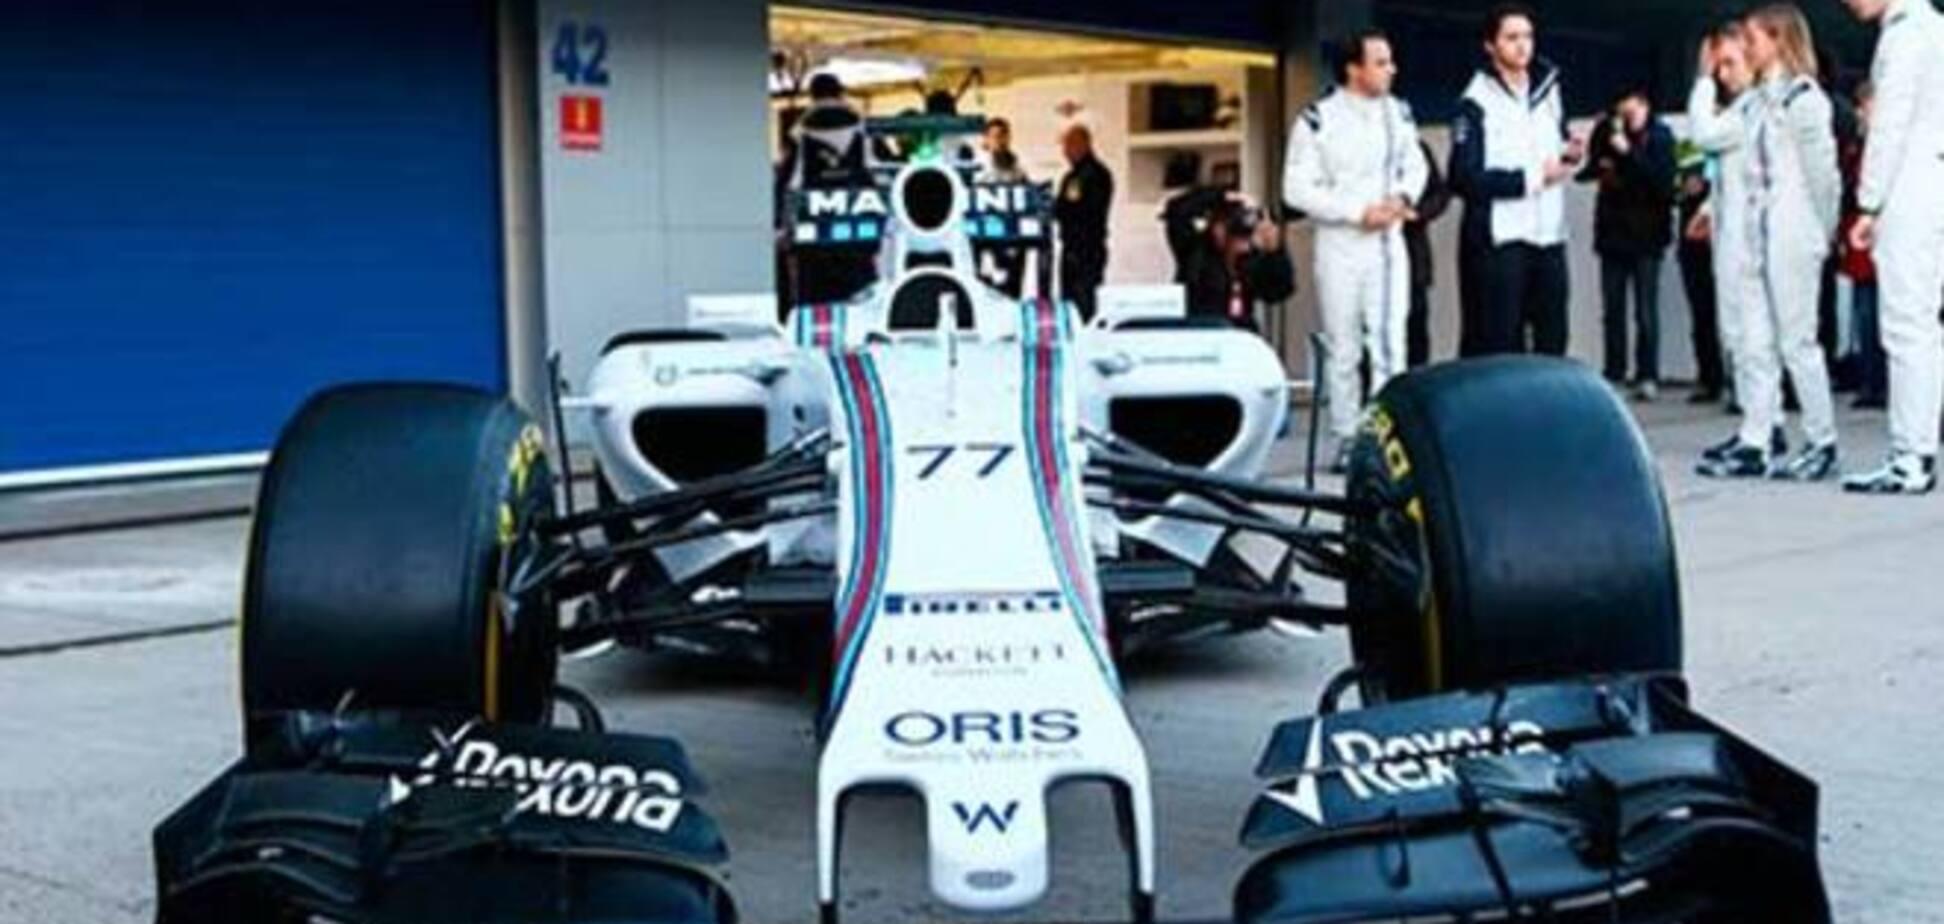 Самая многообещающая команда Формулы-1 представила болид 2015 года